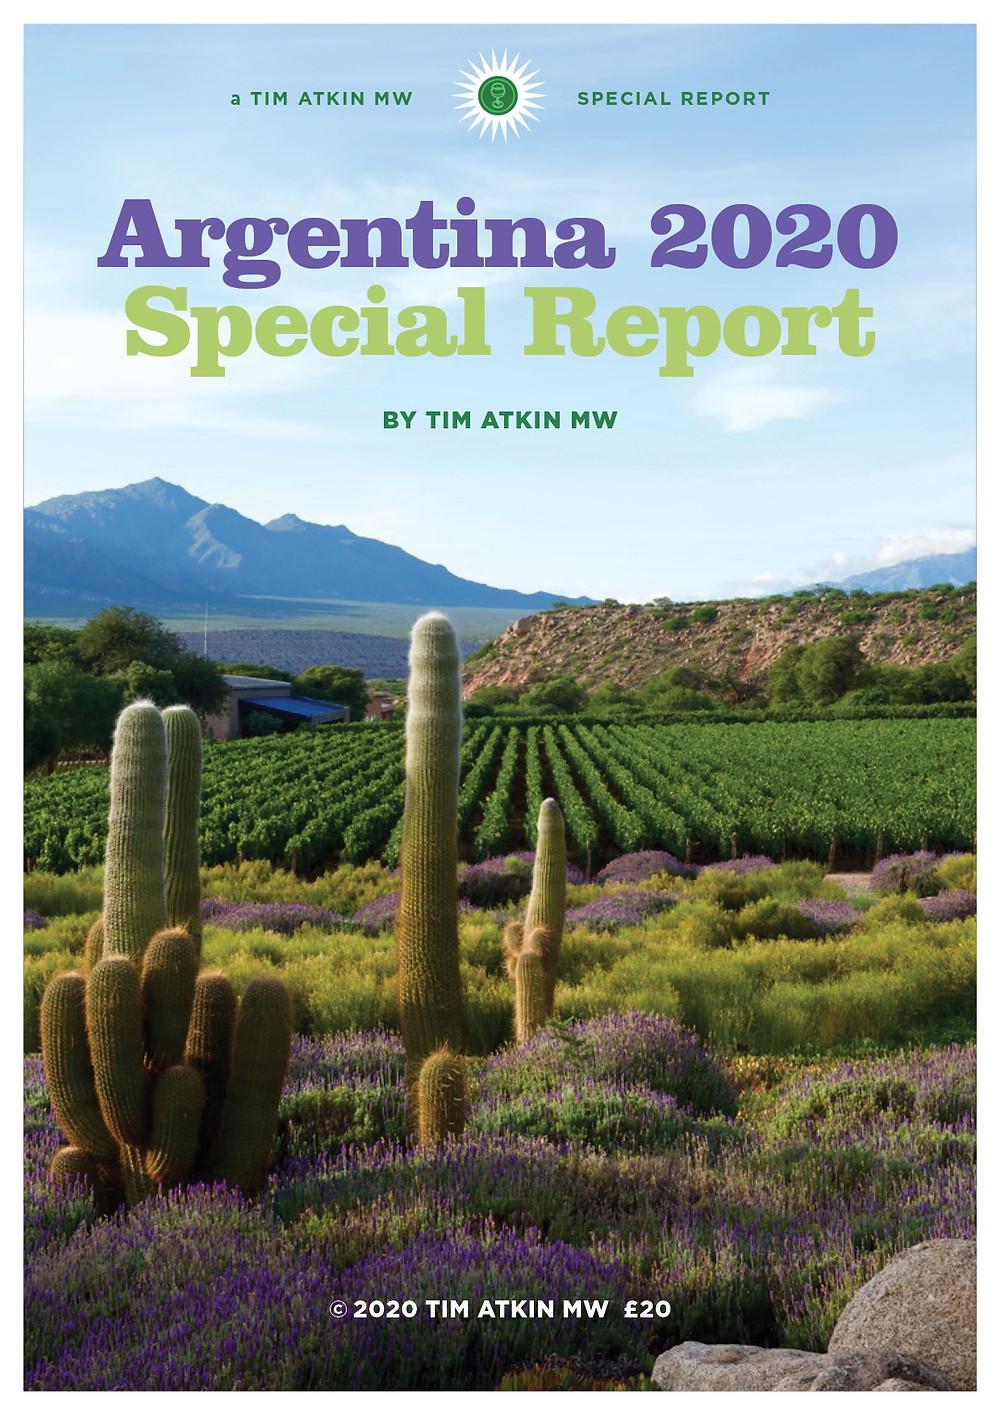 Tim Atkin Argentina 2020 Special Report